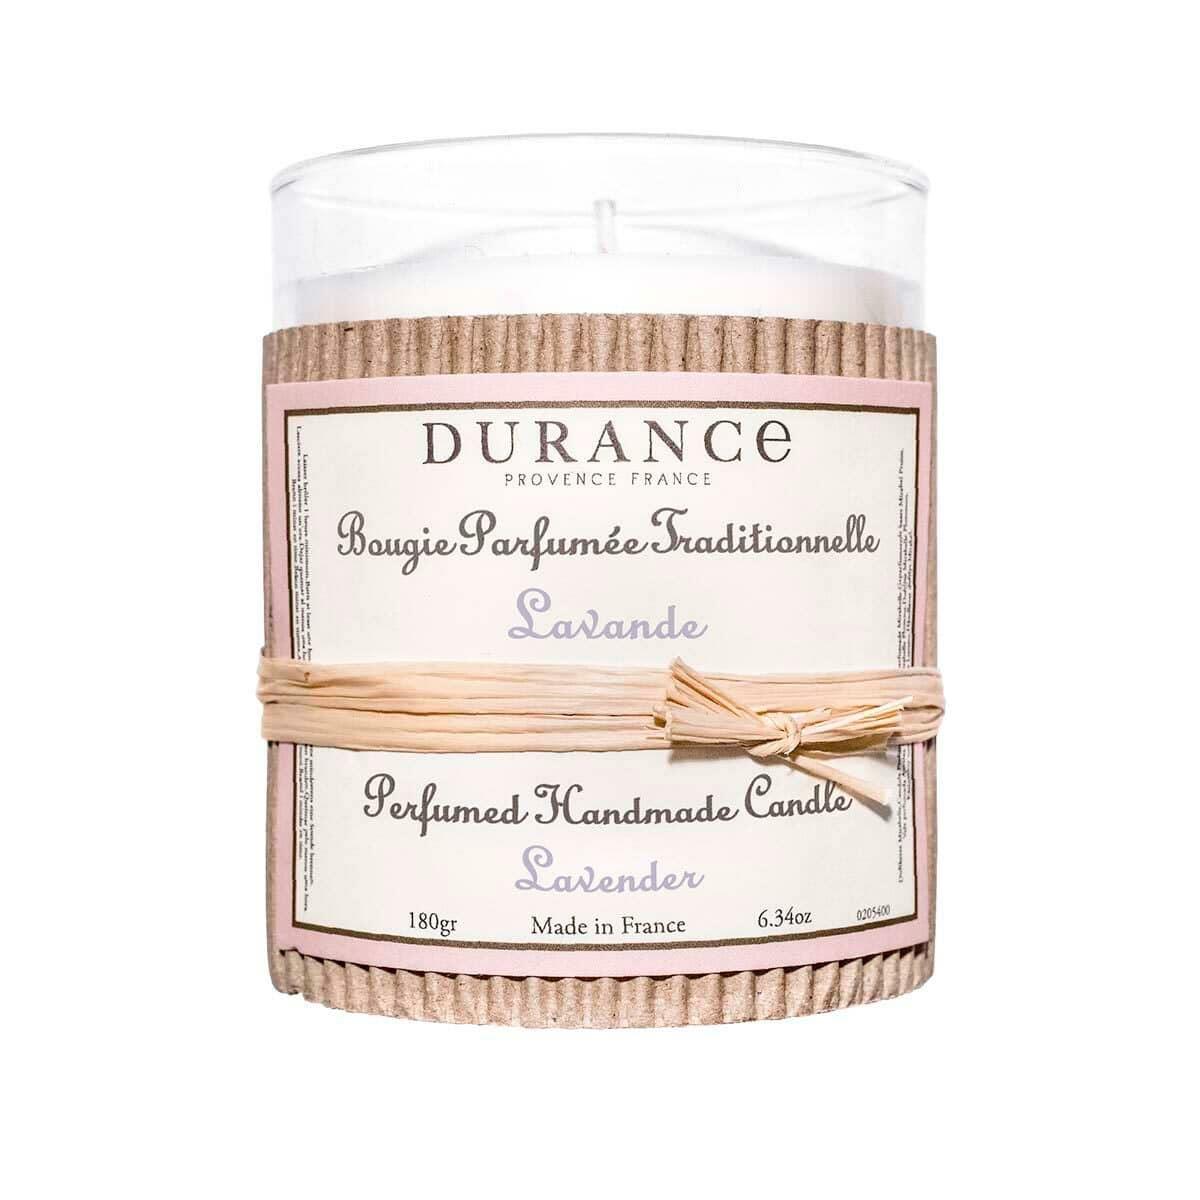 Durance Handgefertigte Duftkerze Lavendel